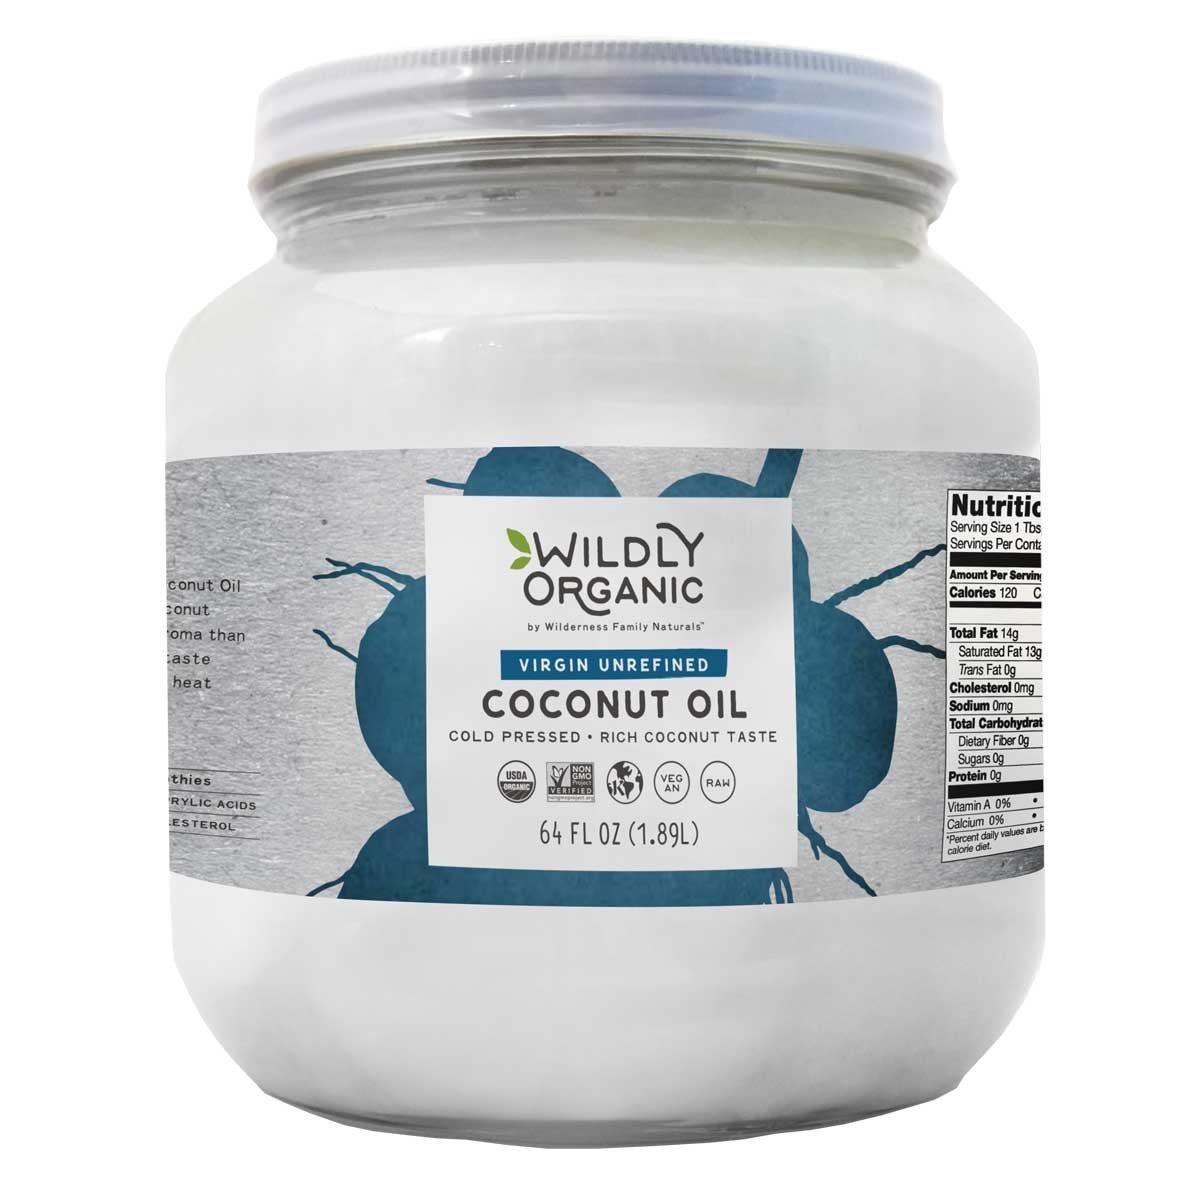 Wildly Organic Coconut Oil Virgin Unrefined (Same As Extra Virgin, Cold Pressed), Non-GMO, Raw - 64 FL OZ